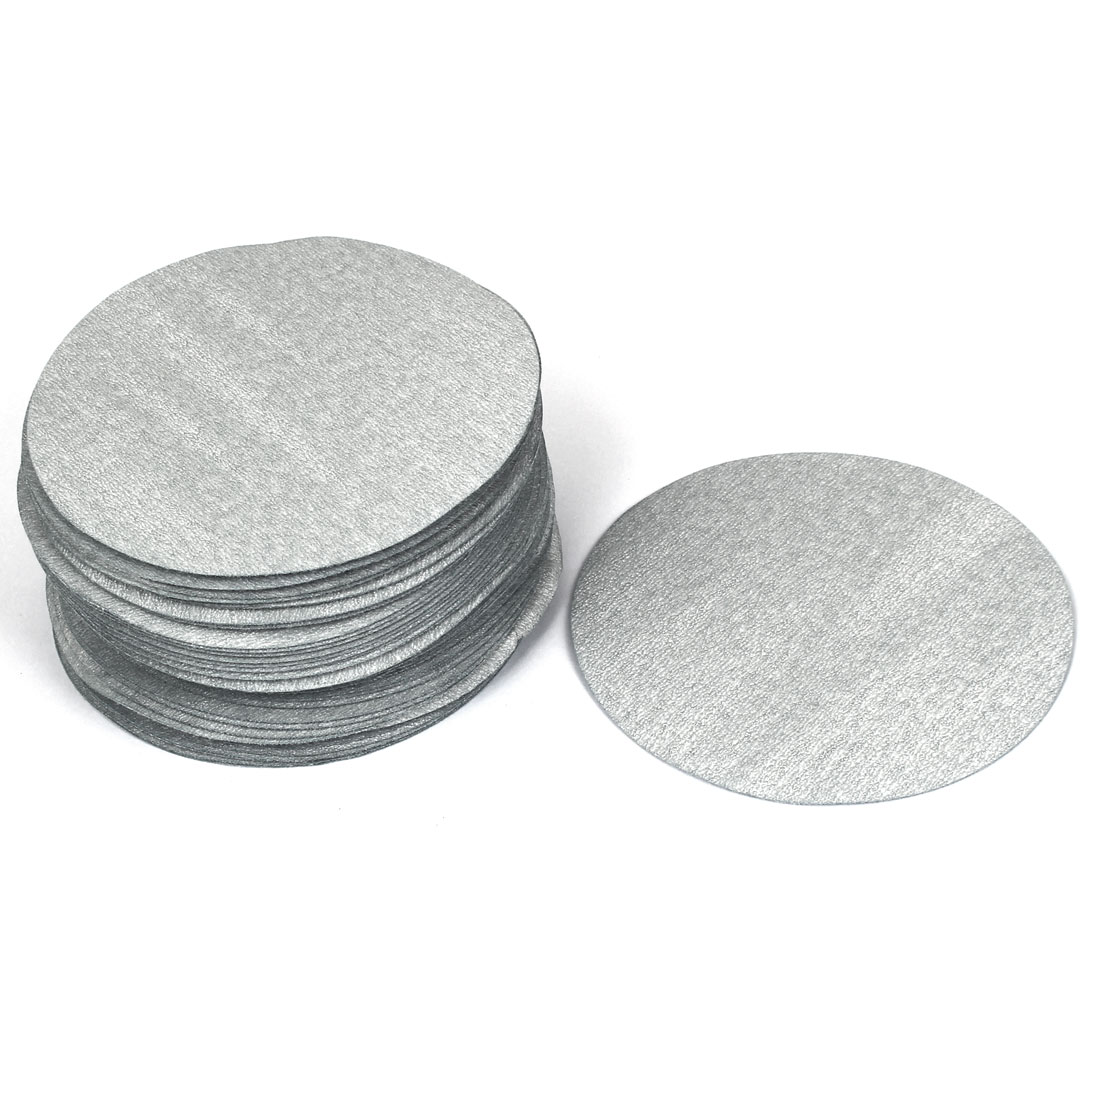 "5"" Dia 600 Grit Abrasive Polishing Hook and Loop Sanding Discs Gray 50 Pcs"